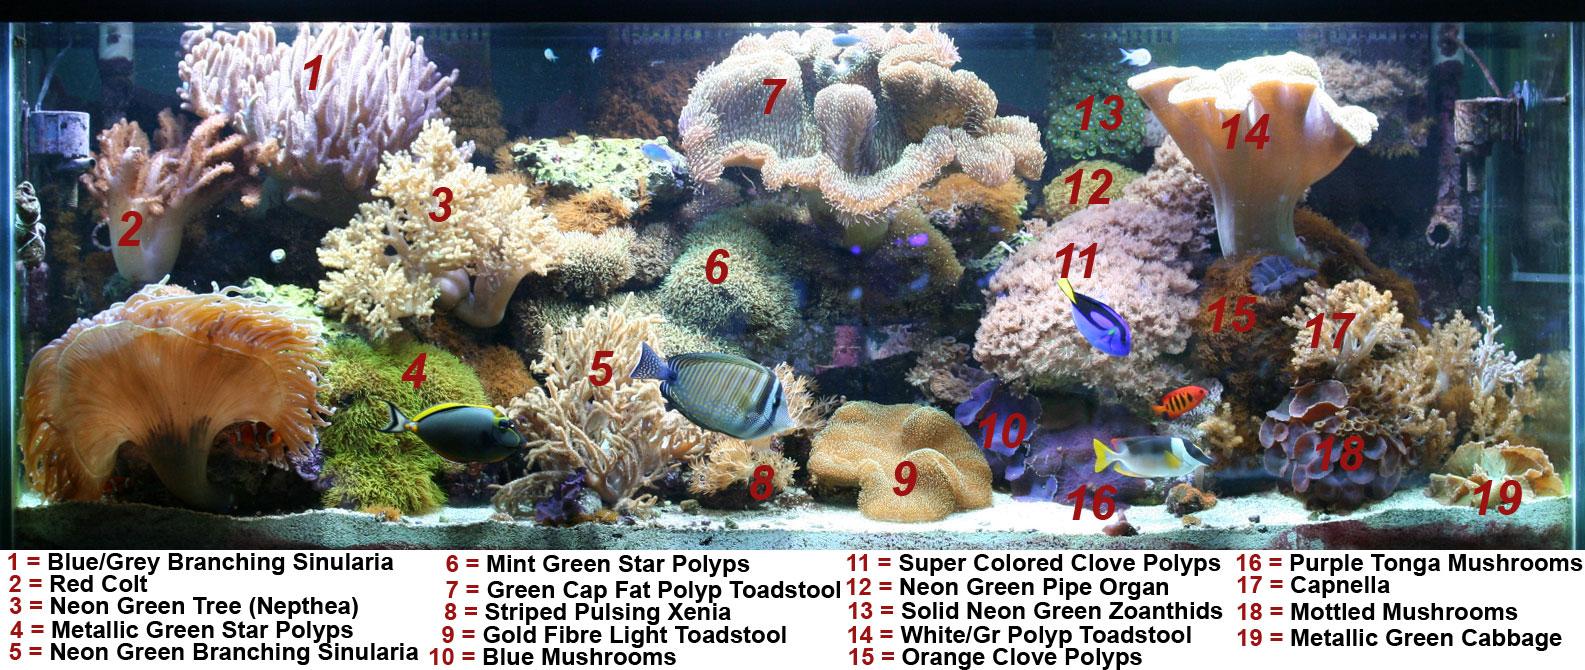 green fibre light toadstool soft coral tank raised soft